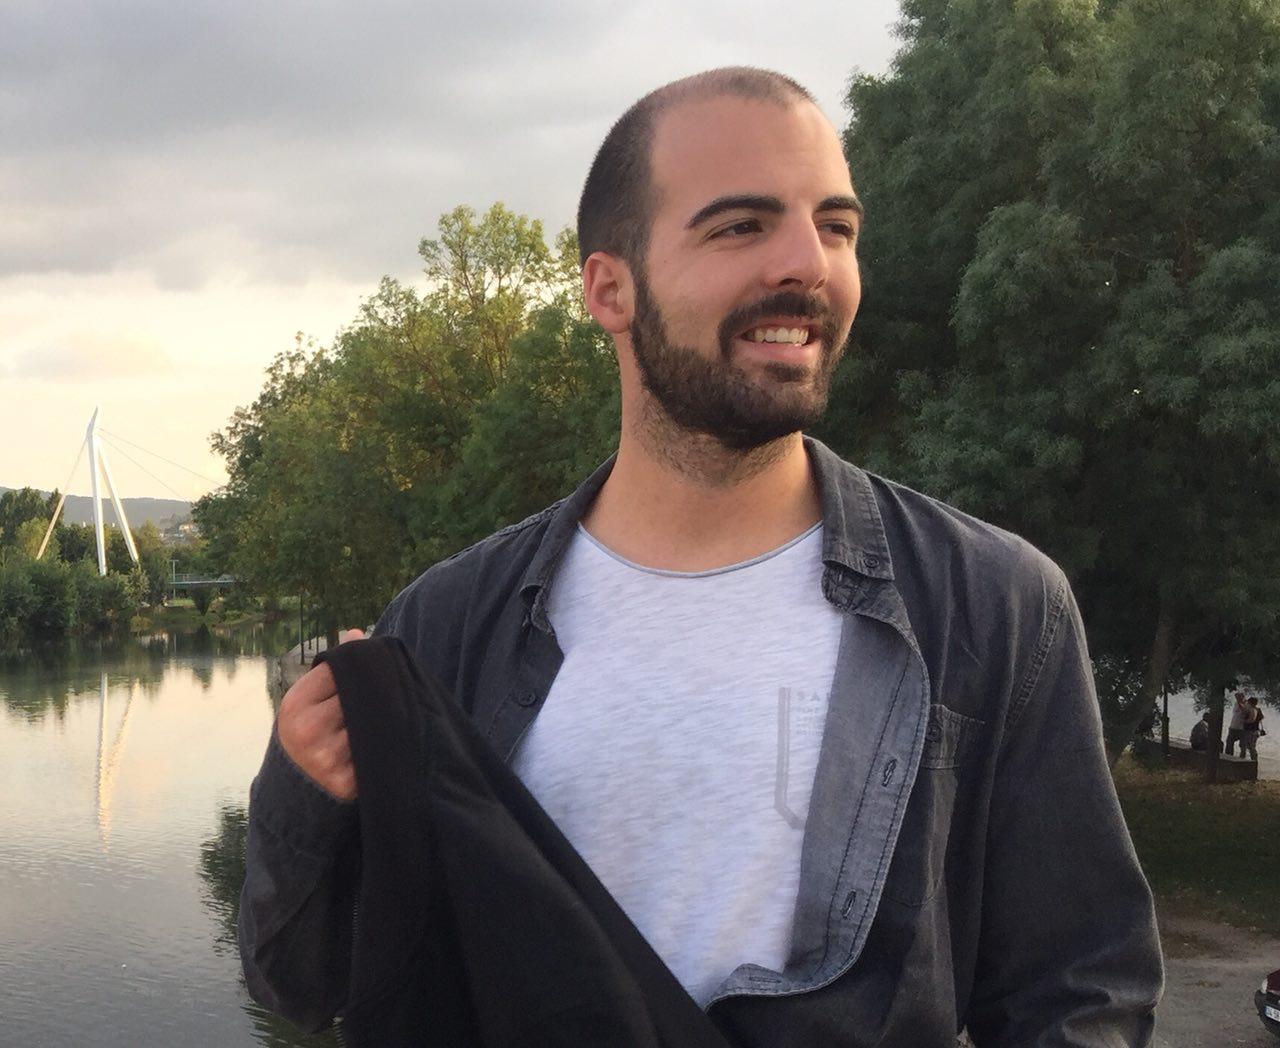 The Ceo of the WallID, Filipe Veiga